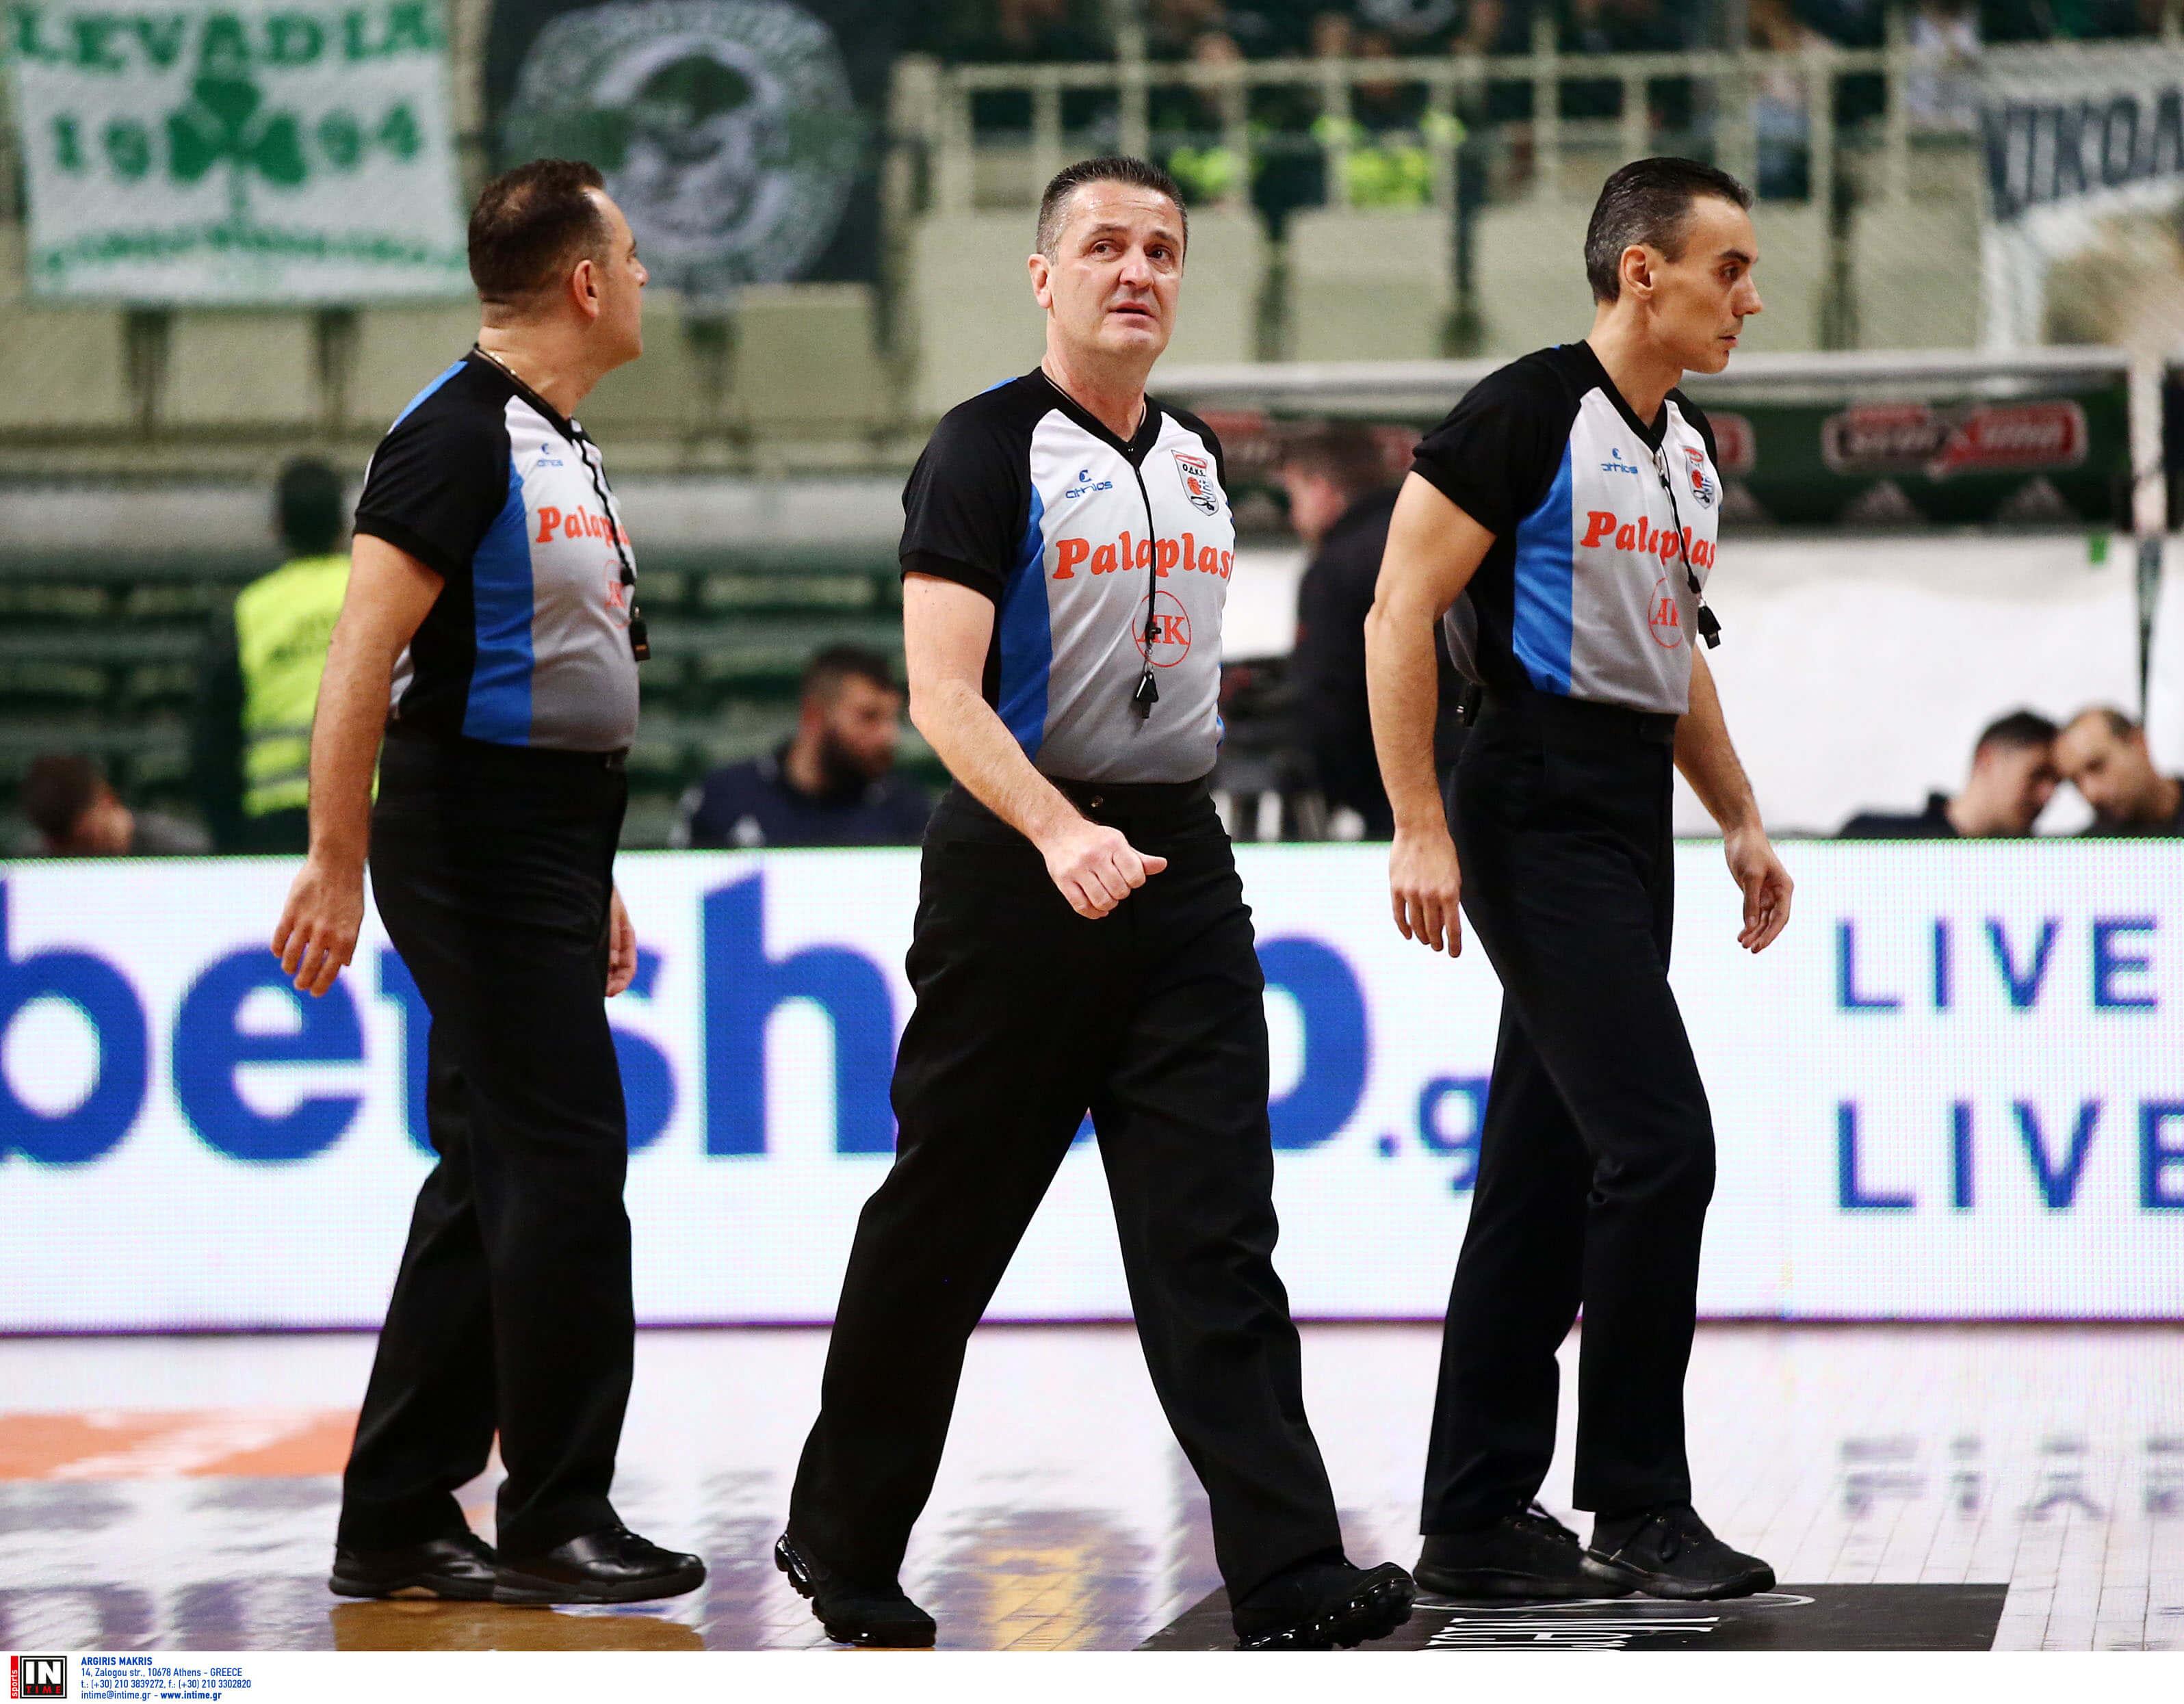 Basket League: Τέλος οι Αναστόπουλος και Σχινάς από την ελληνική διαιτησία